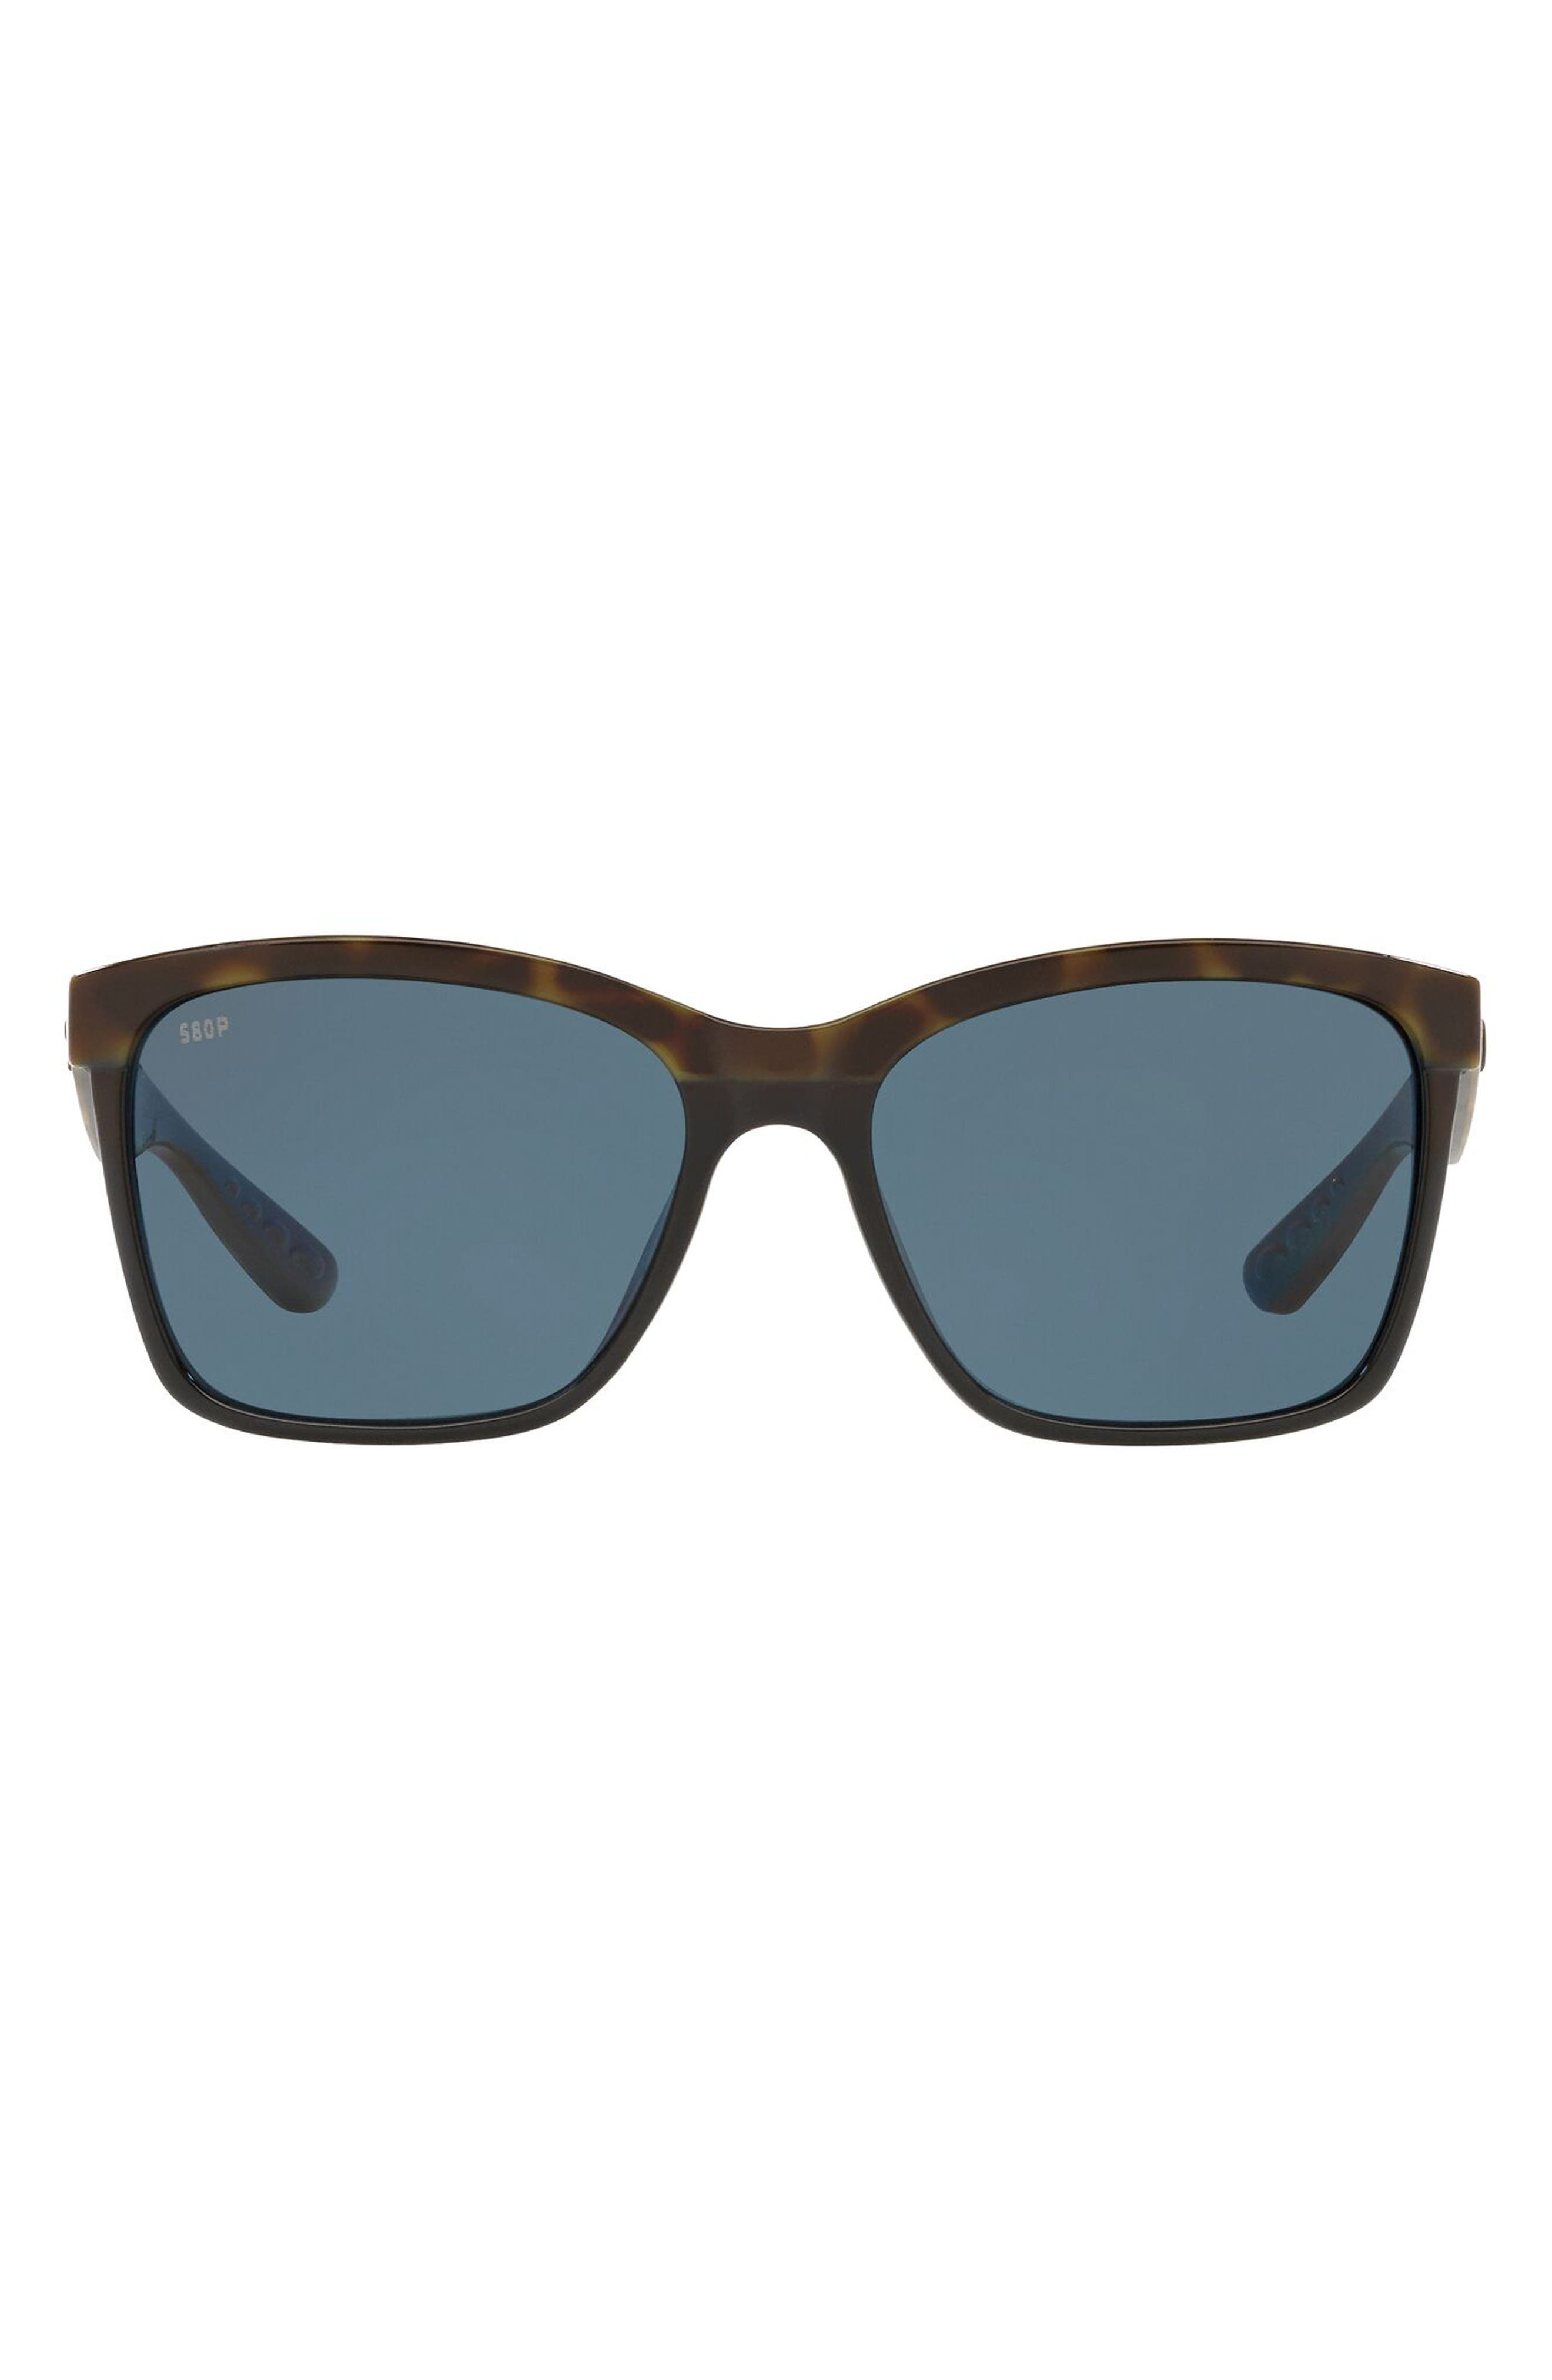 55mm Polarized Rectangular Sunglasses